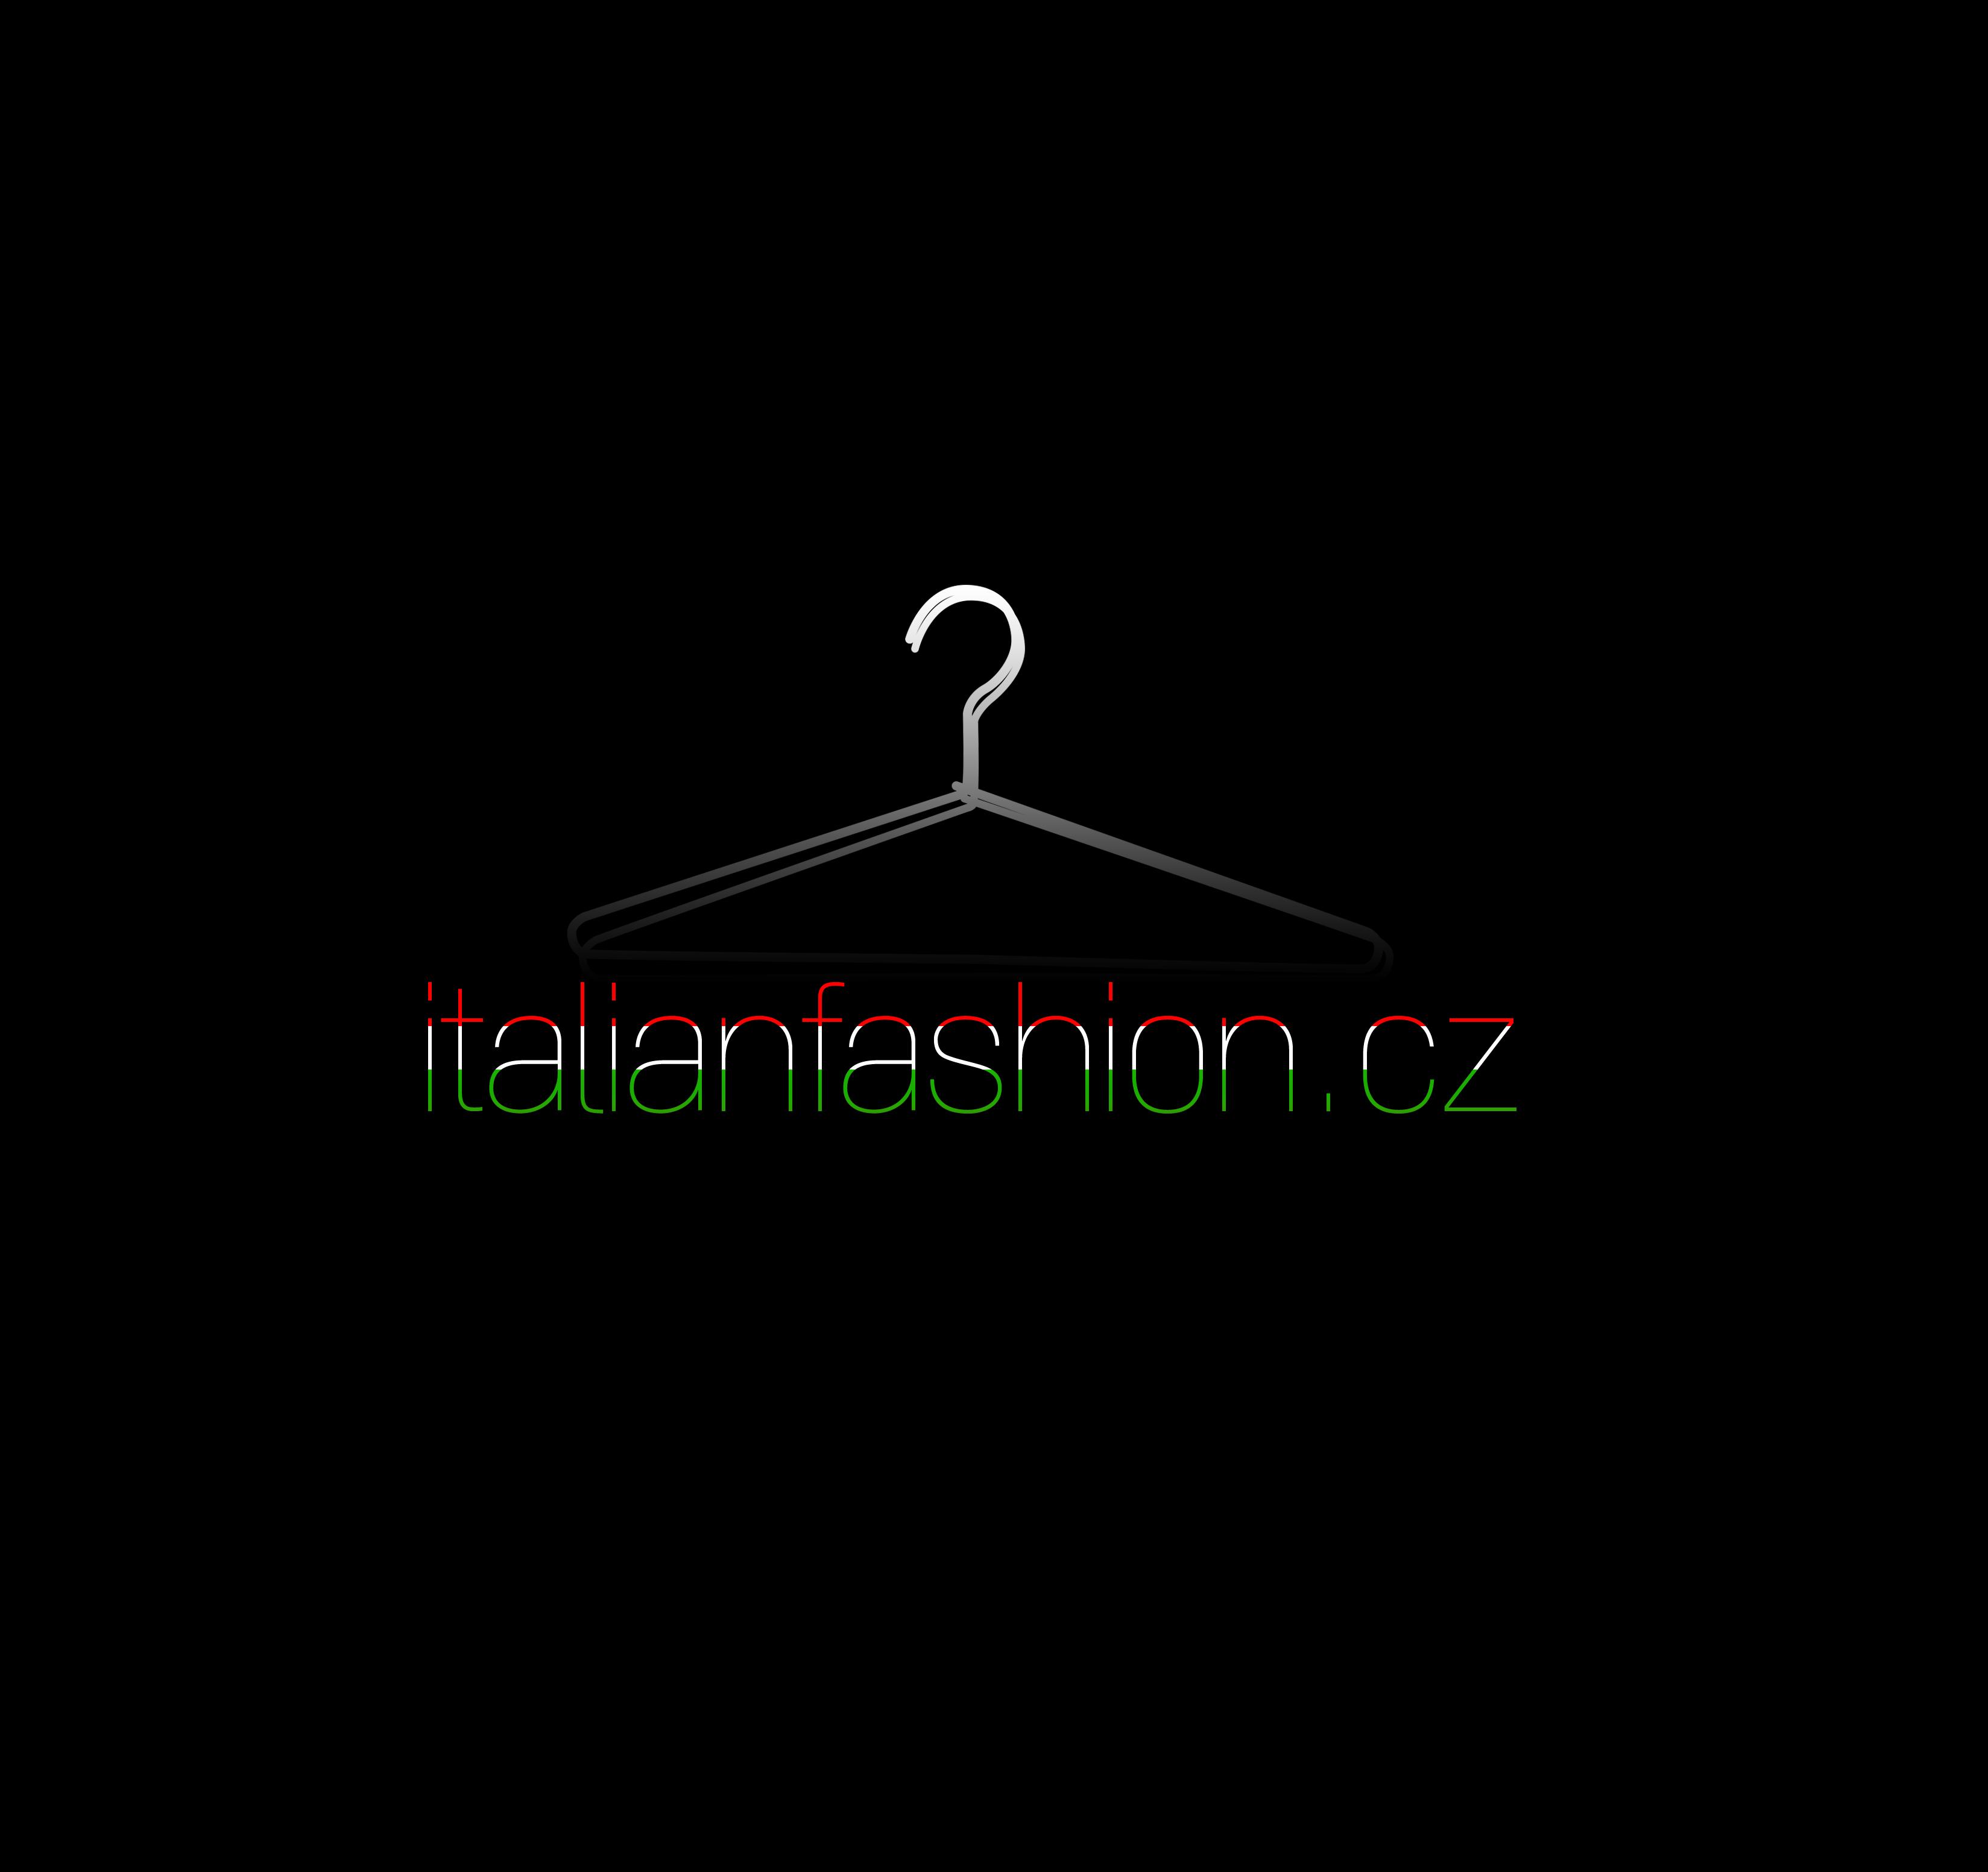 Logo Design by madis - Entry No. 10 in the Logo Design Contest Logo for Web Page ItalianFashion.cz.